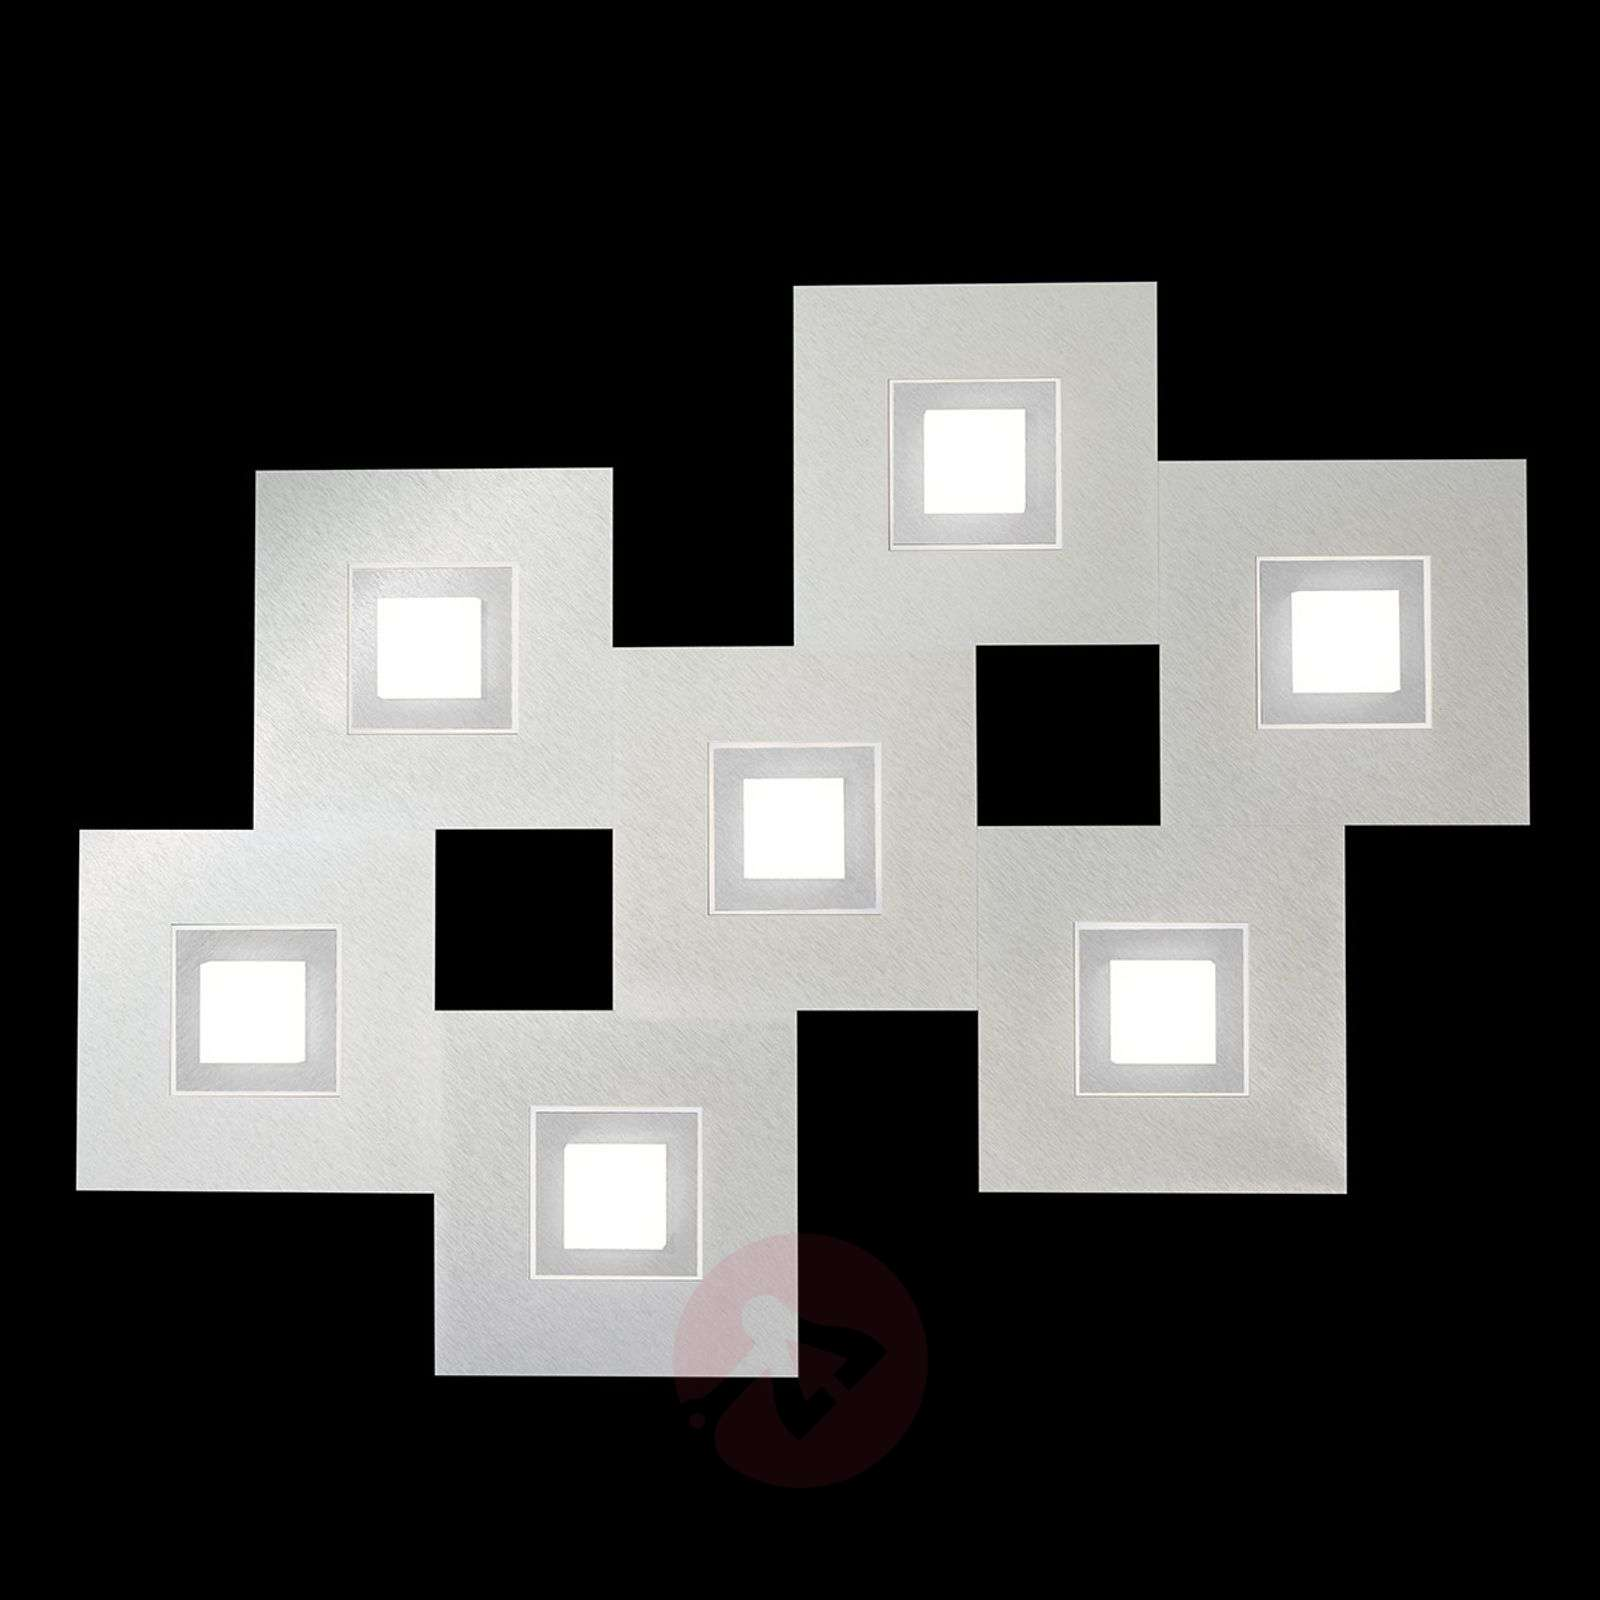 GROSSMANN Karree LED-kattovalaisin, 7-lampp.-4022047X-01